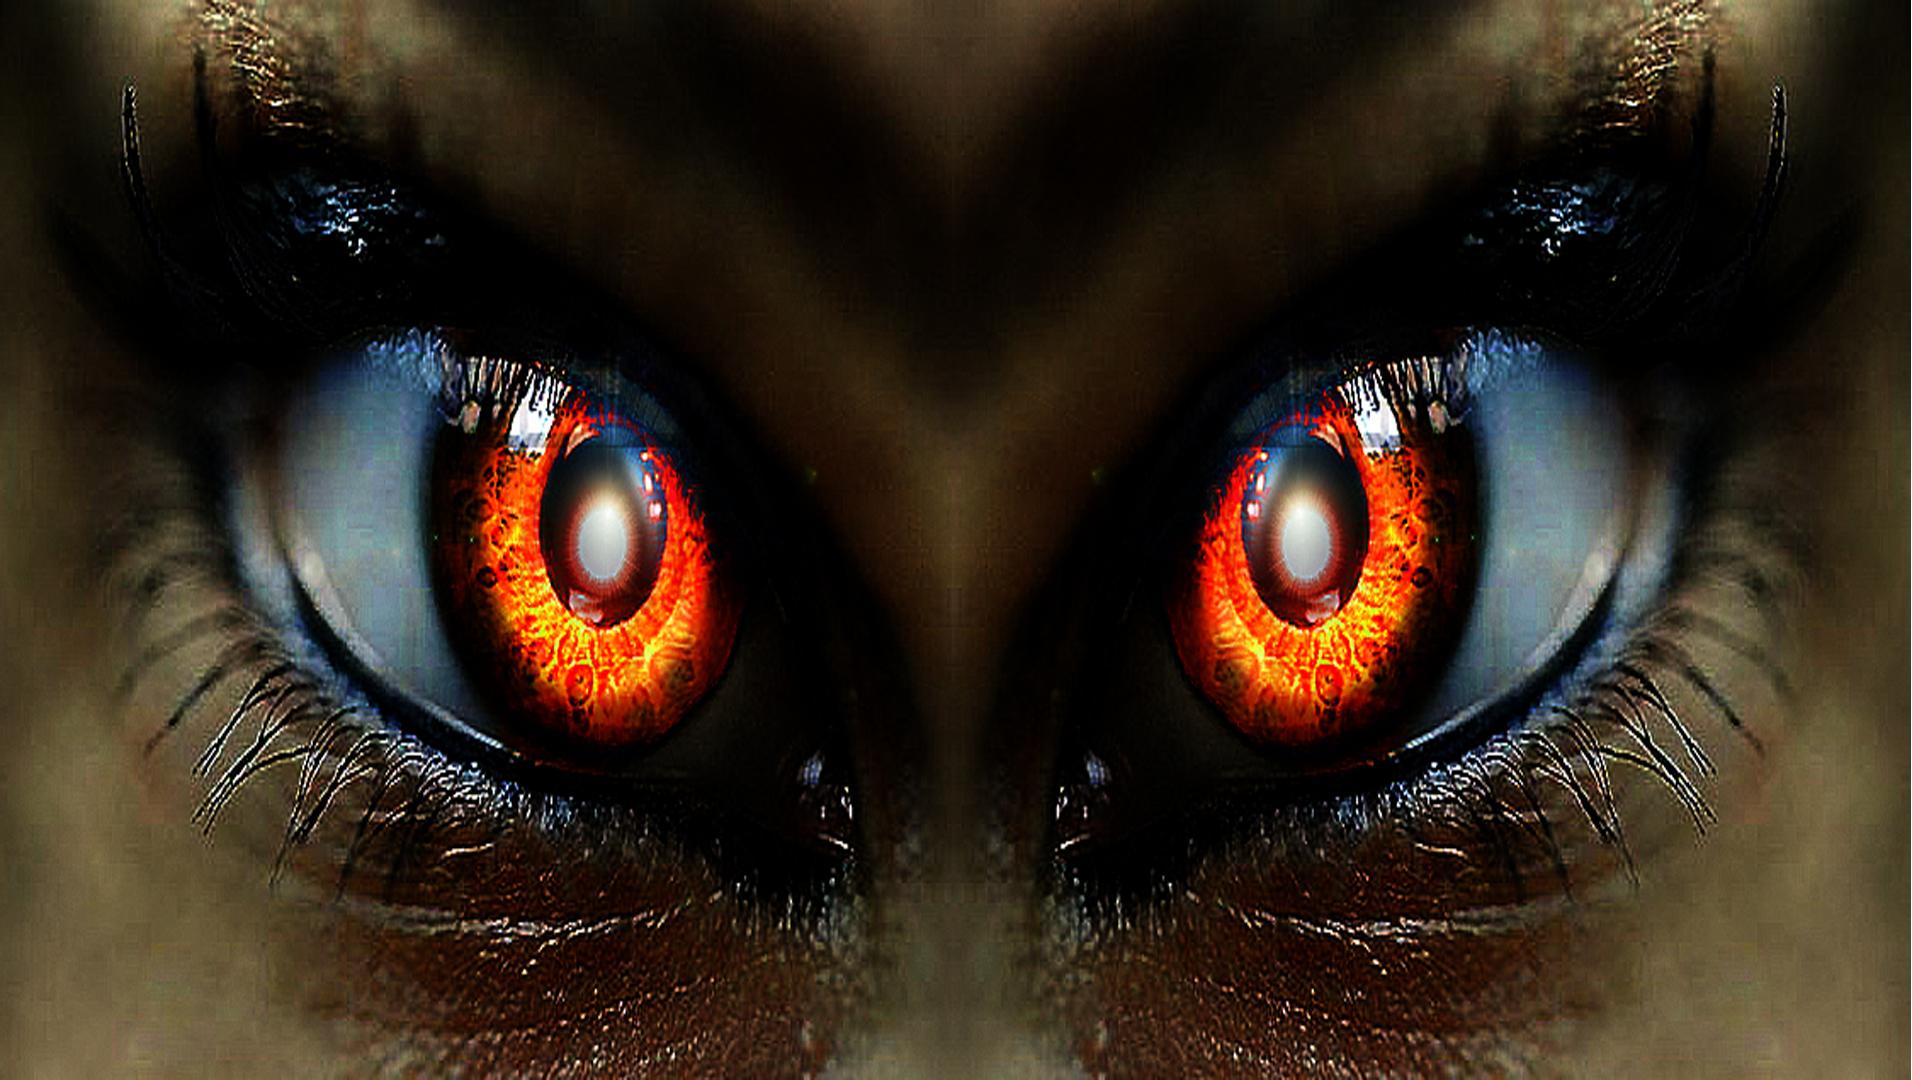 dark inside demon eye quotevcom - HD1912×1080